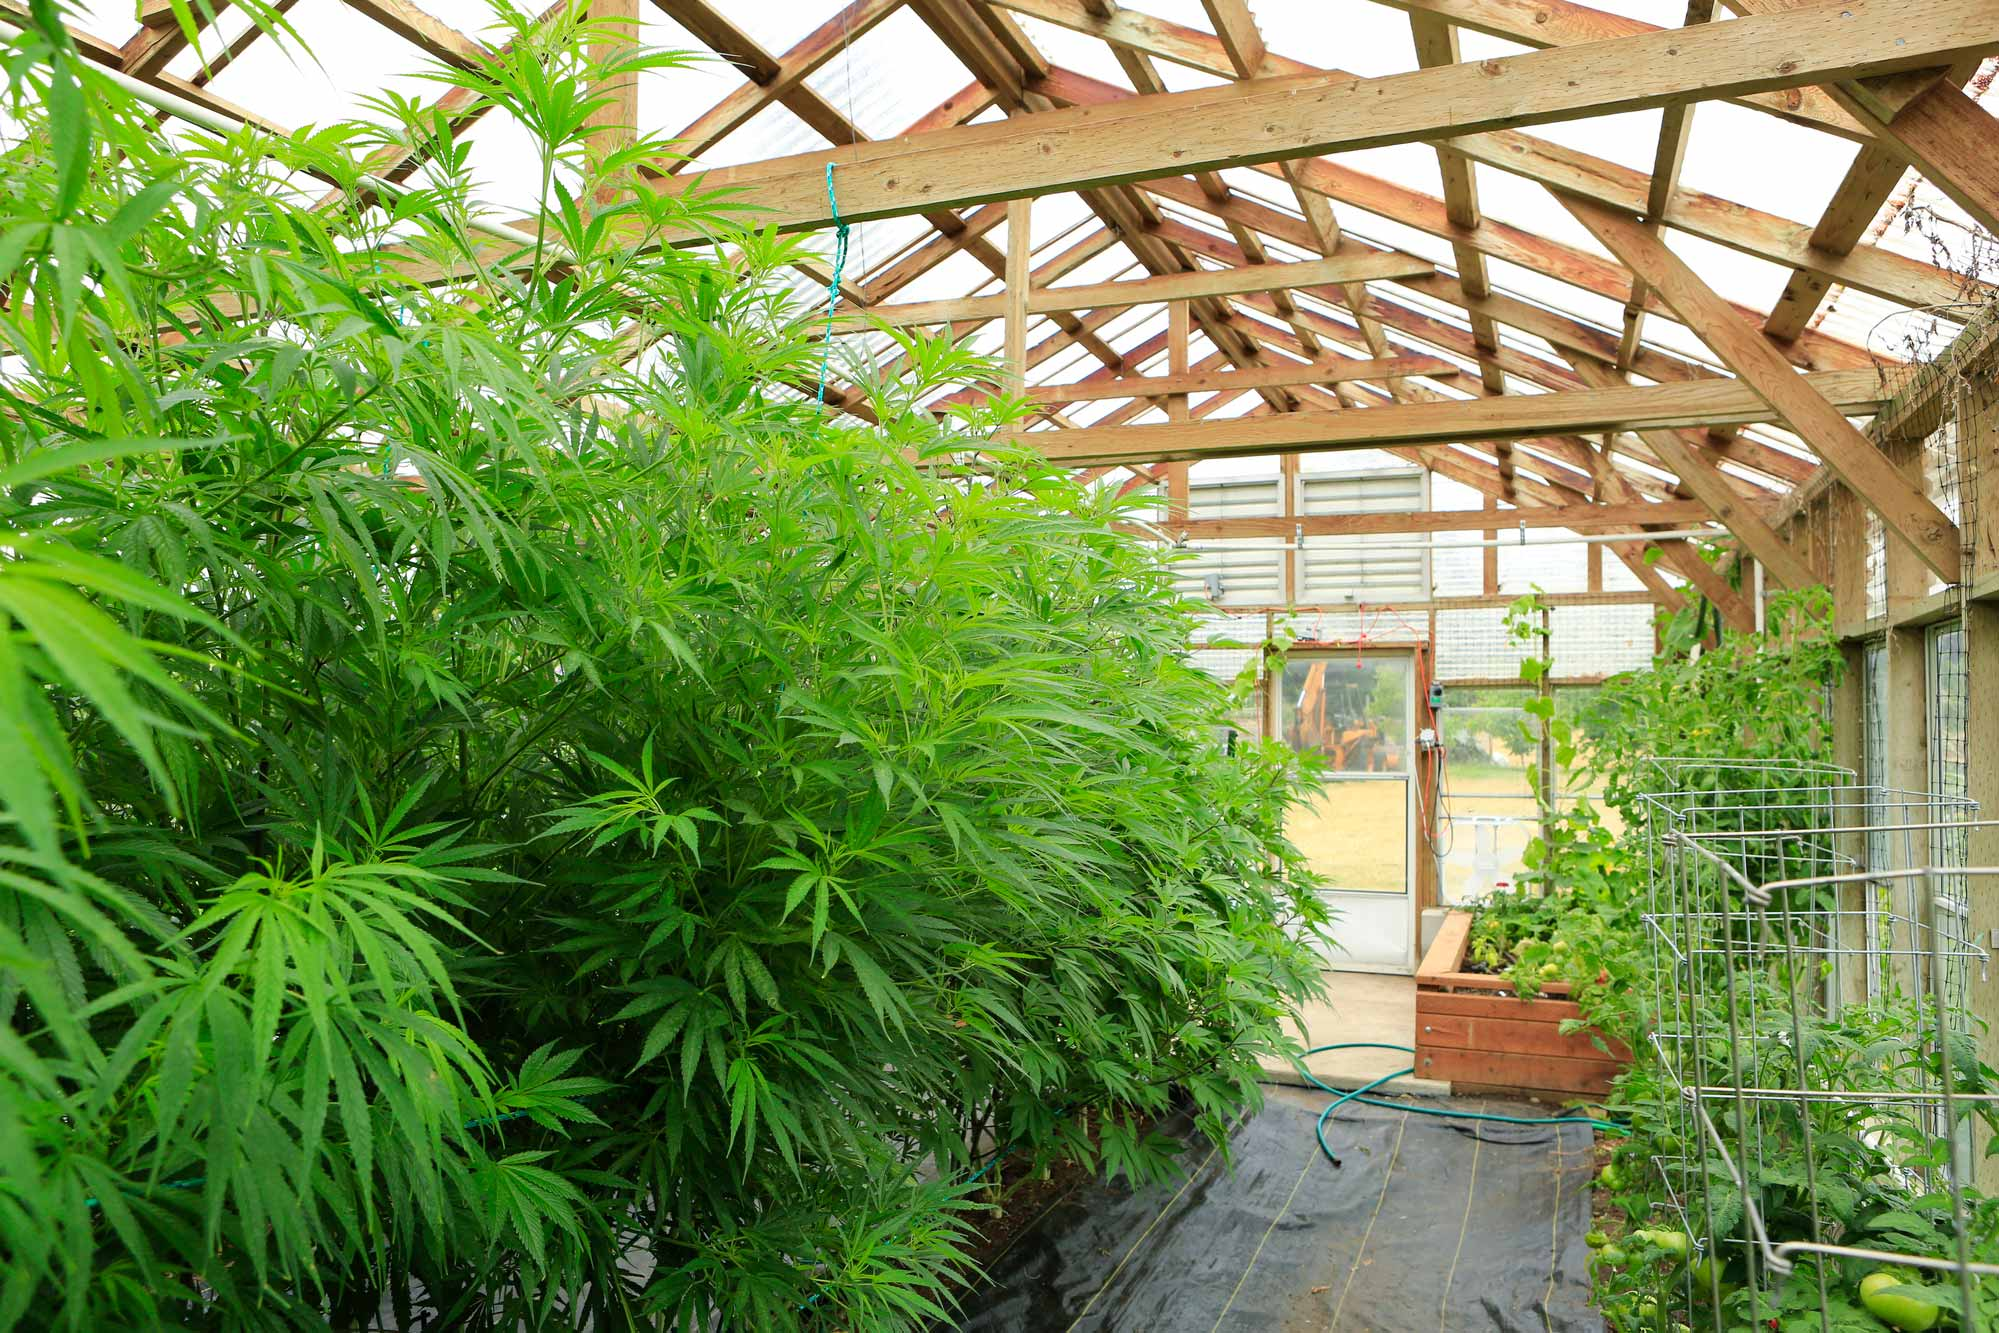 Canabis Grower 4